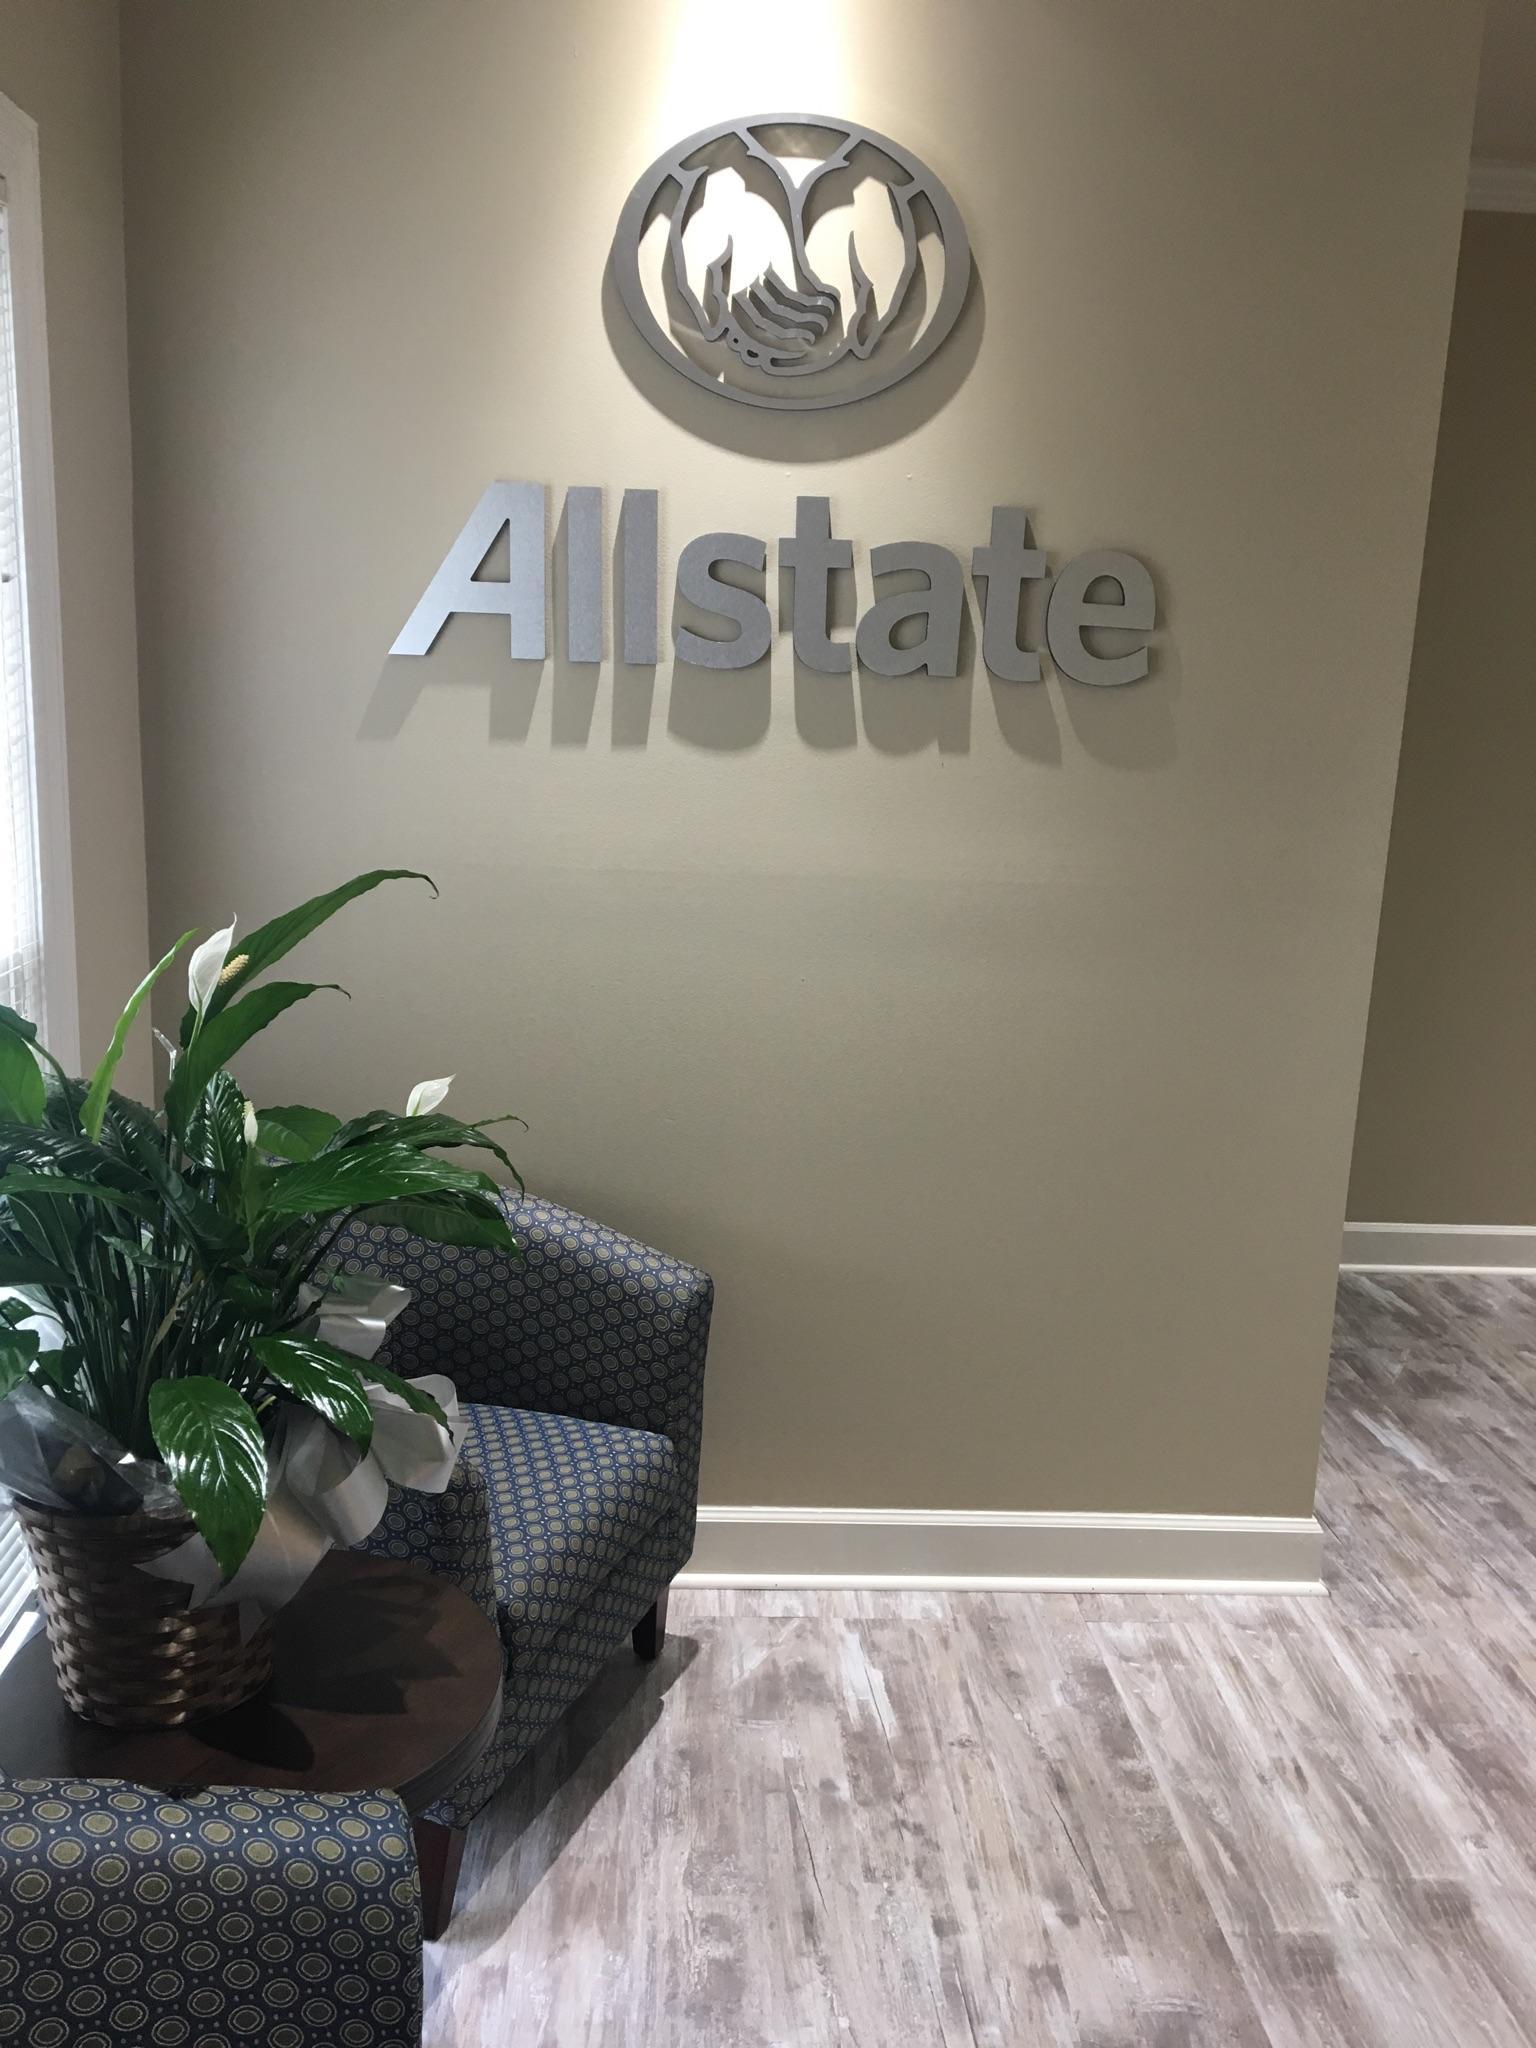 Ken Needham: Allstate Insurance